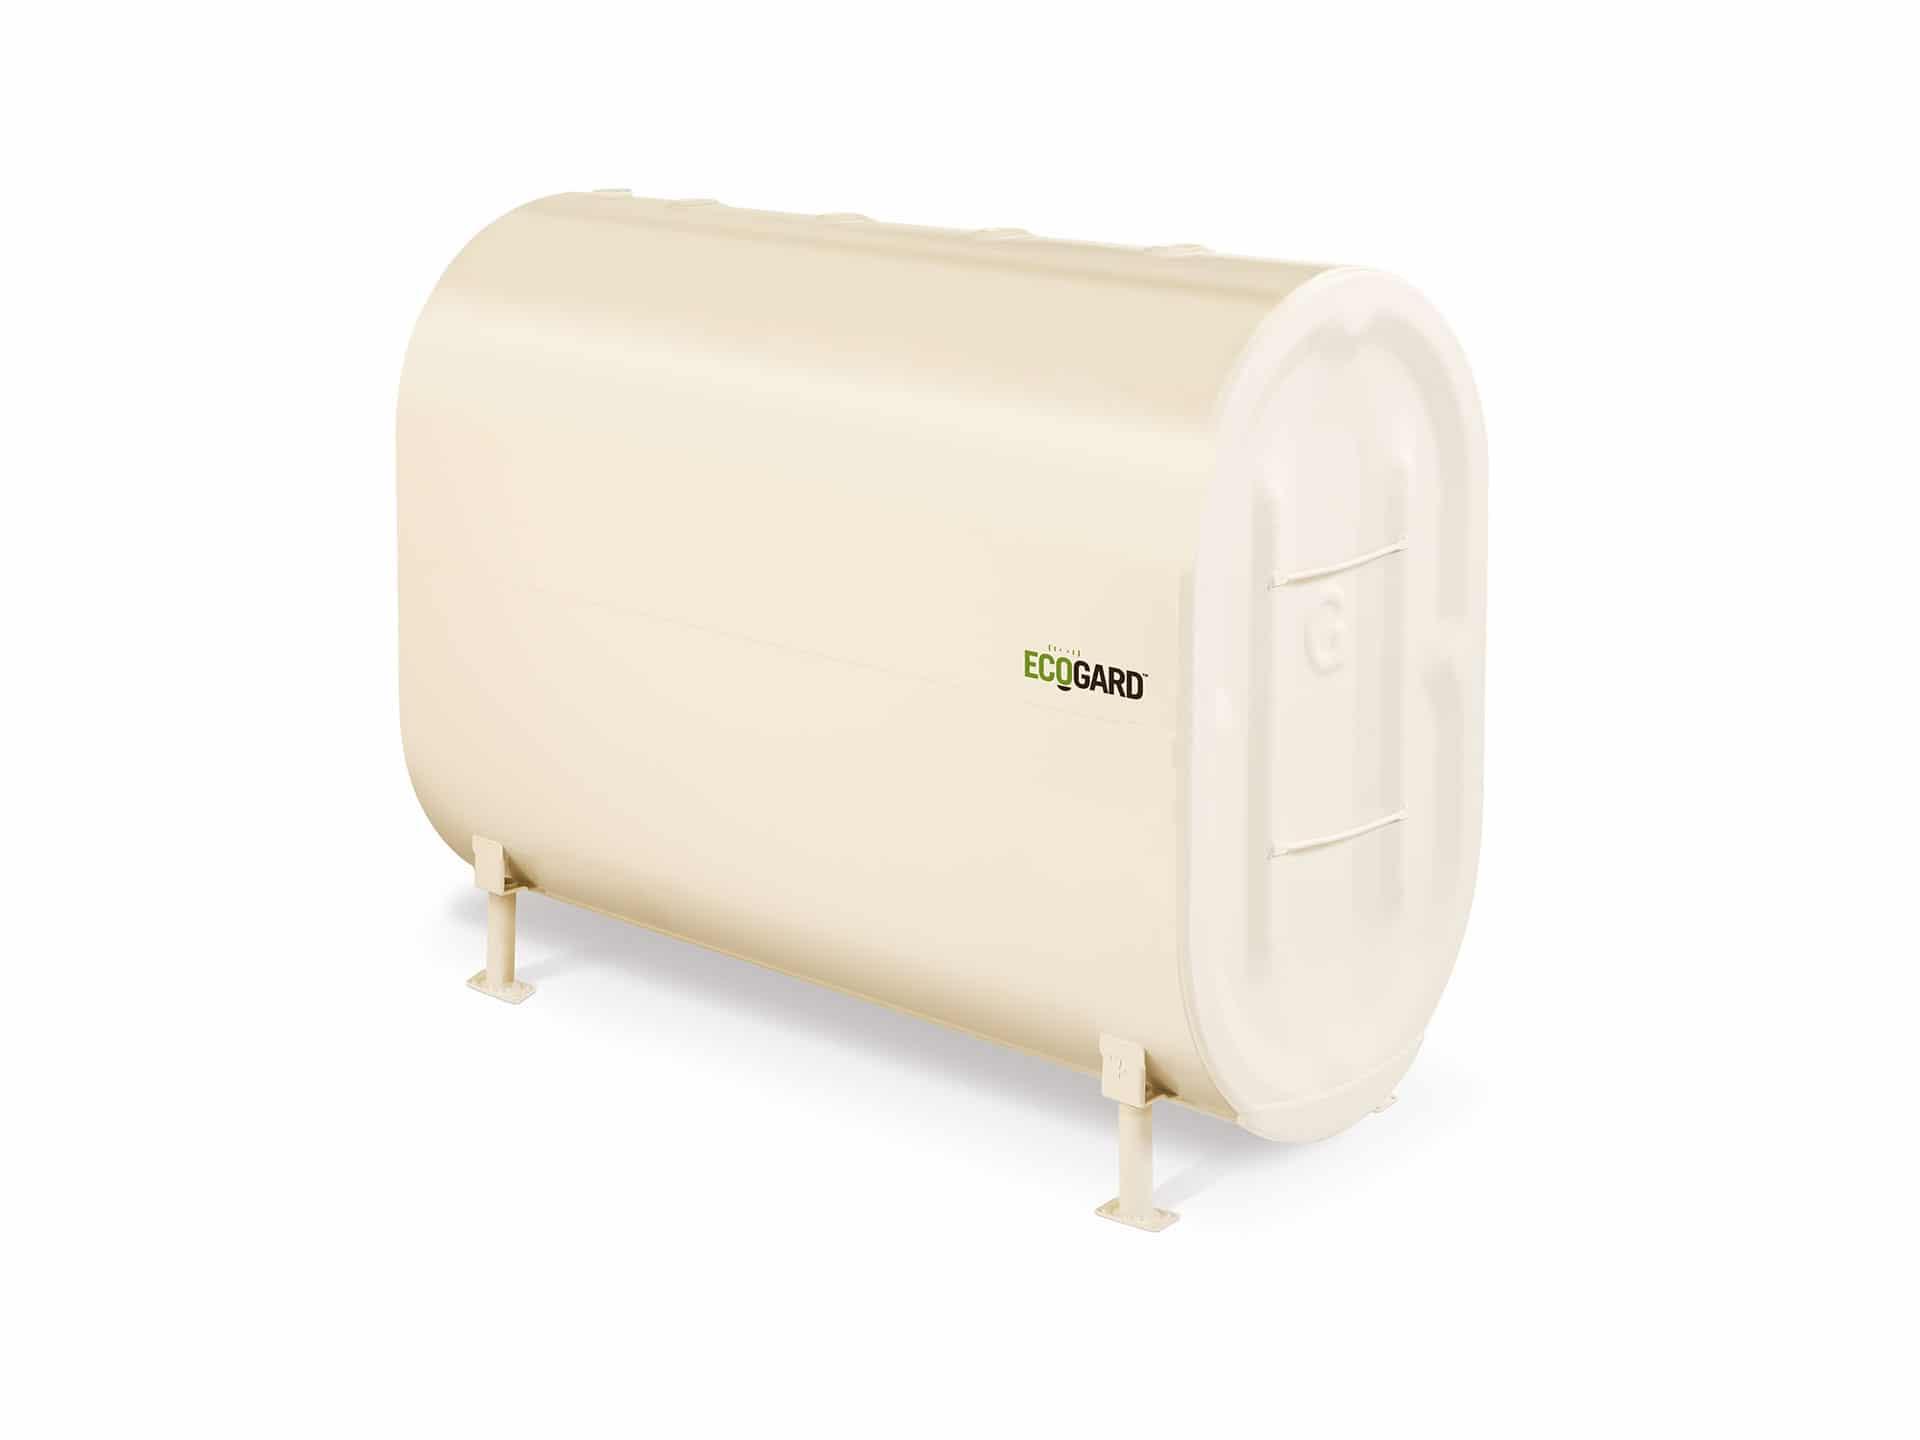 Ecogard double bottom tank | Granby Industries